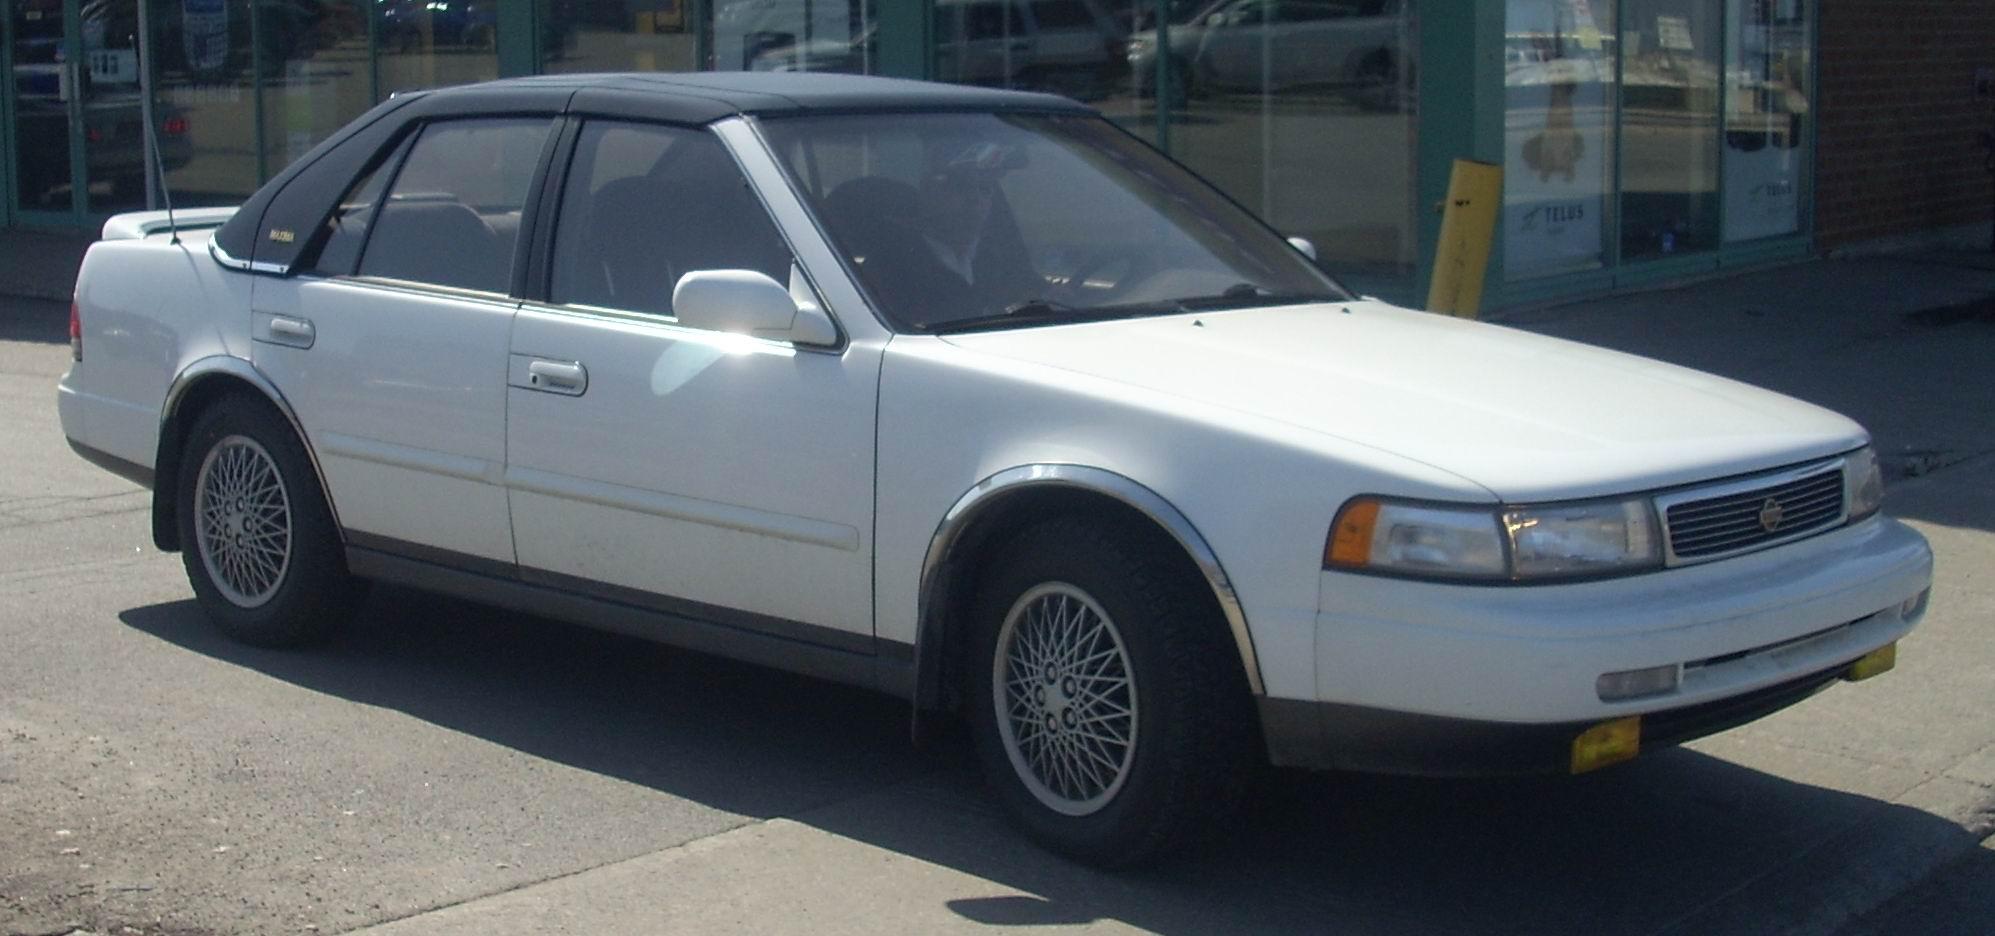 File:'92-'94 Nissan Maxima.JPG - Wikimedia Commons